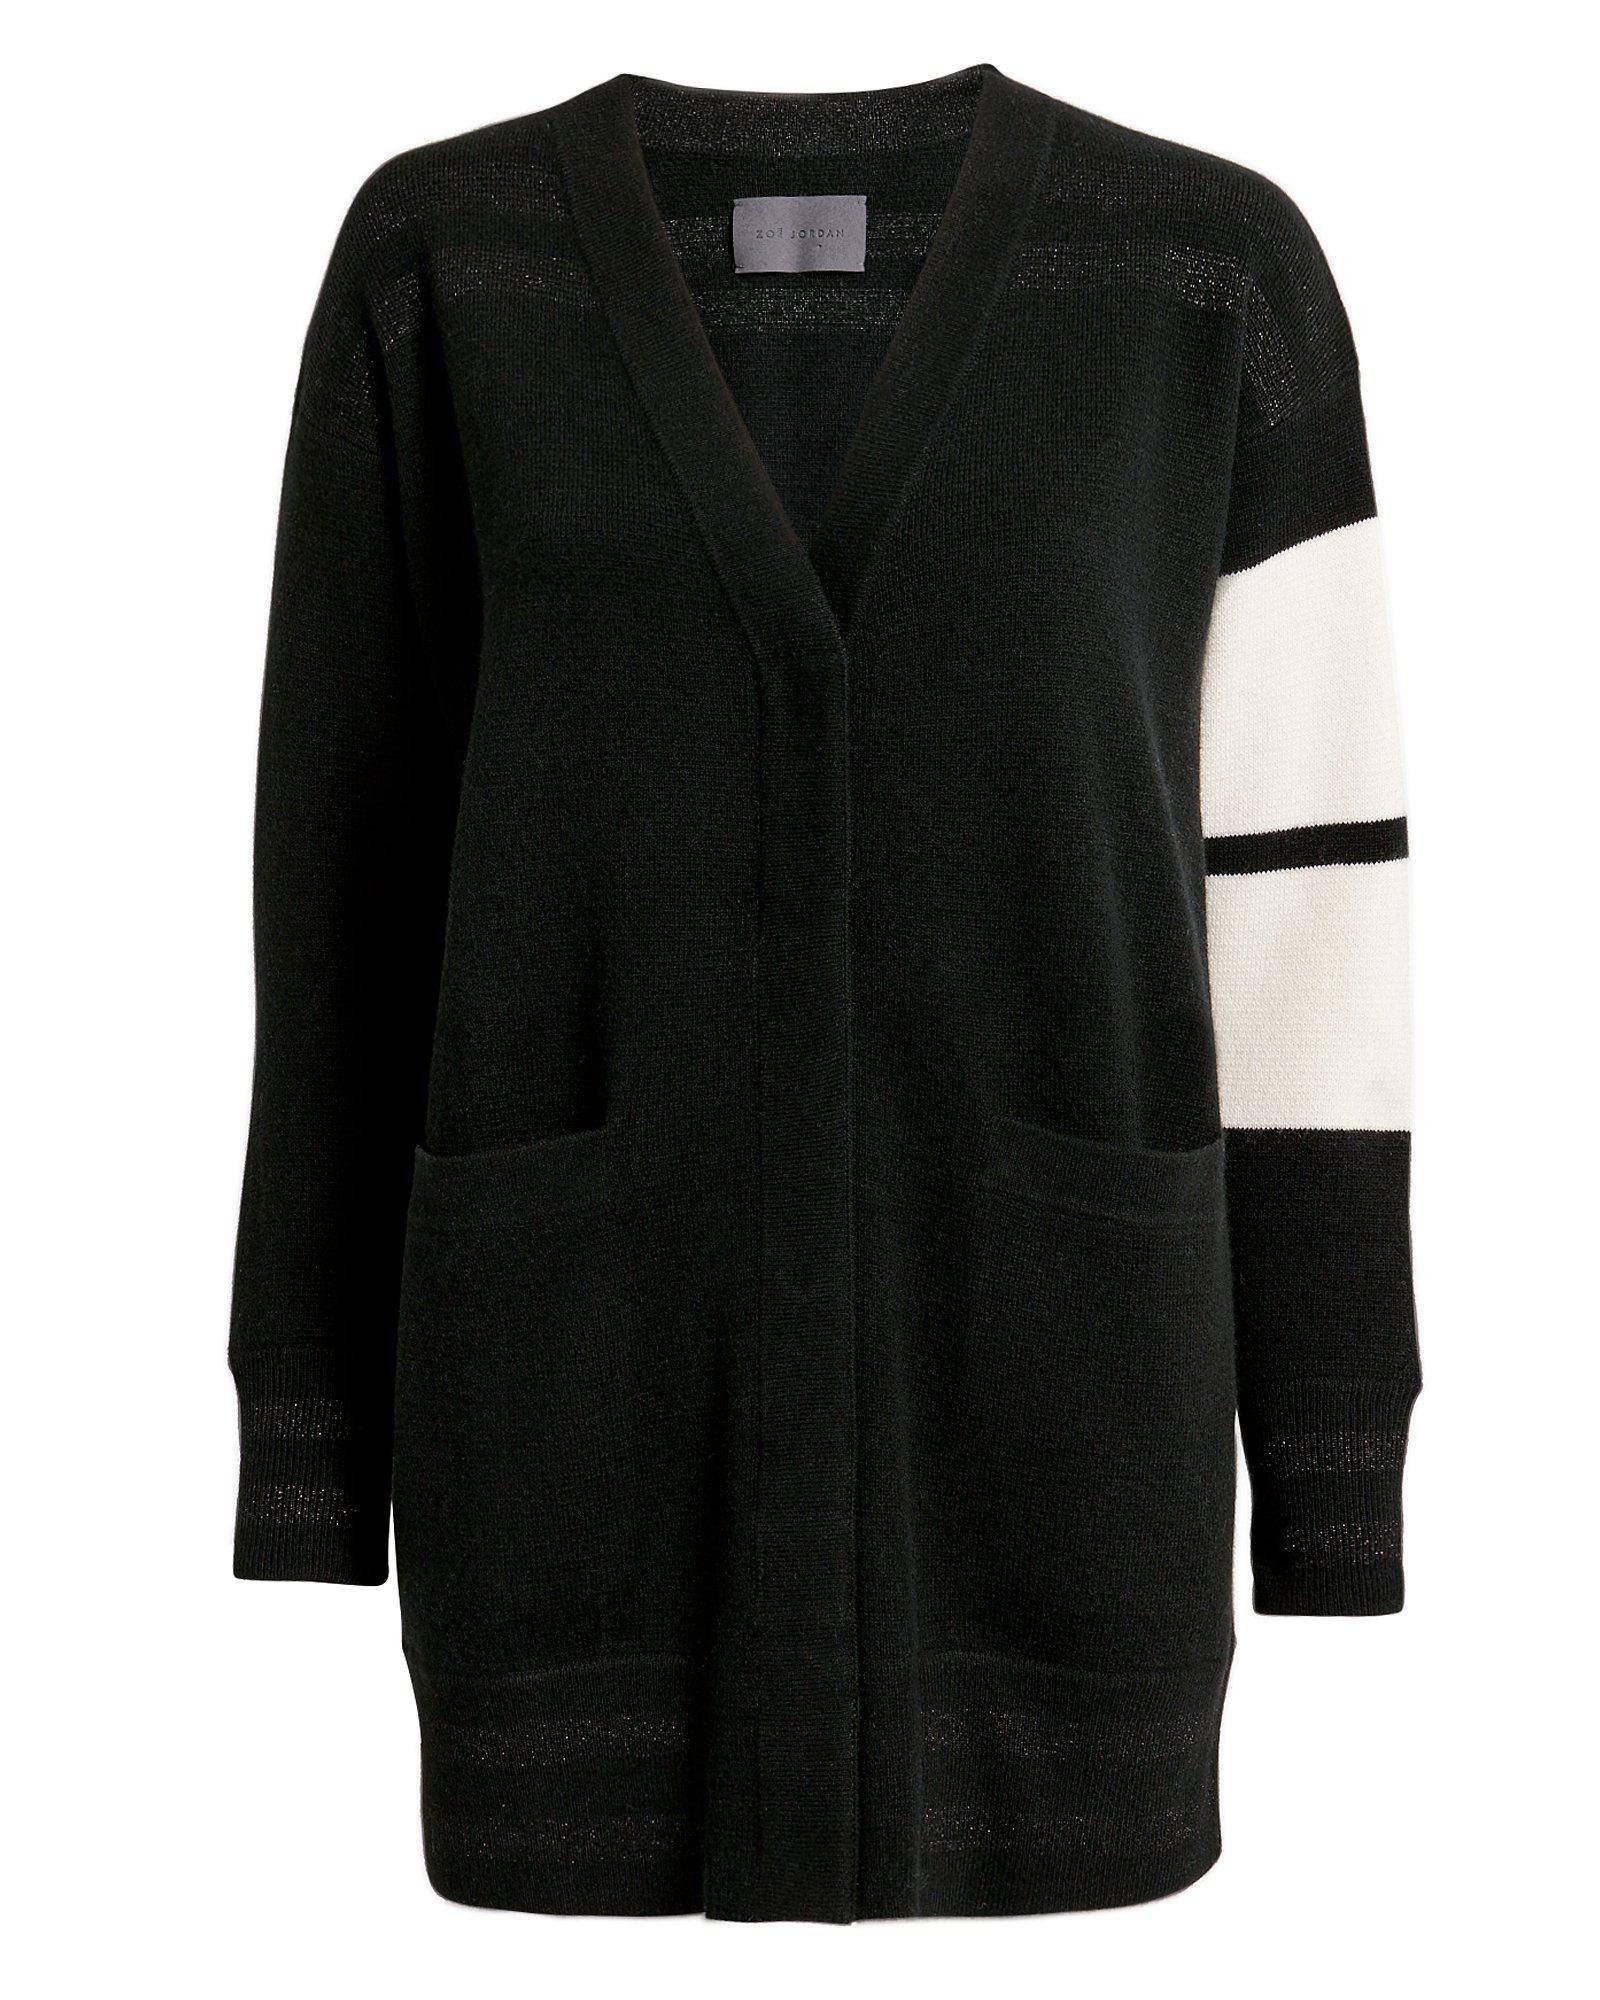 da4e1ab0df99 Lyst - Zoe Jordan Longline Edison Cardigan in Black